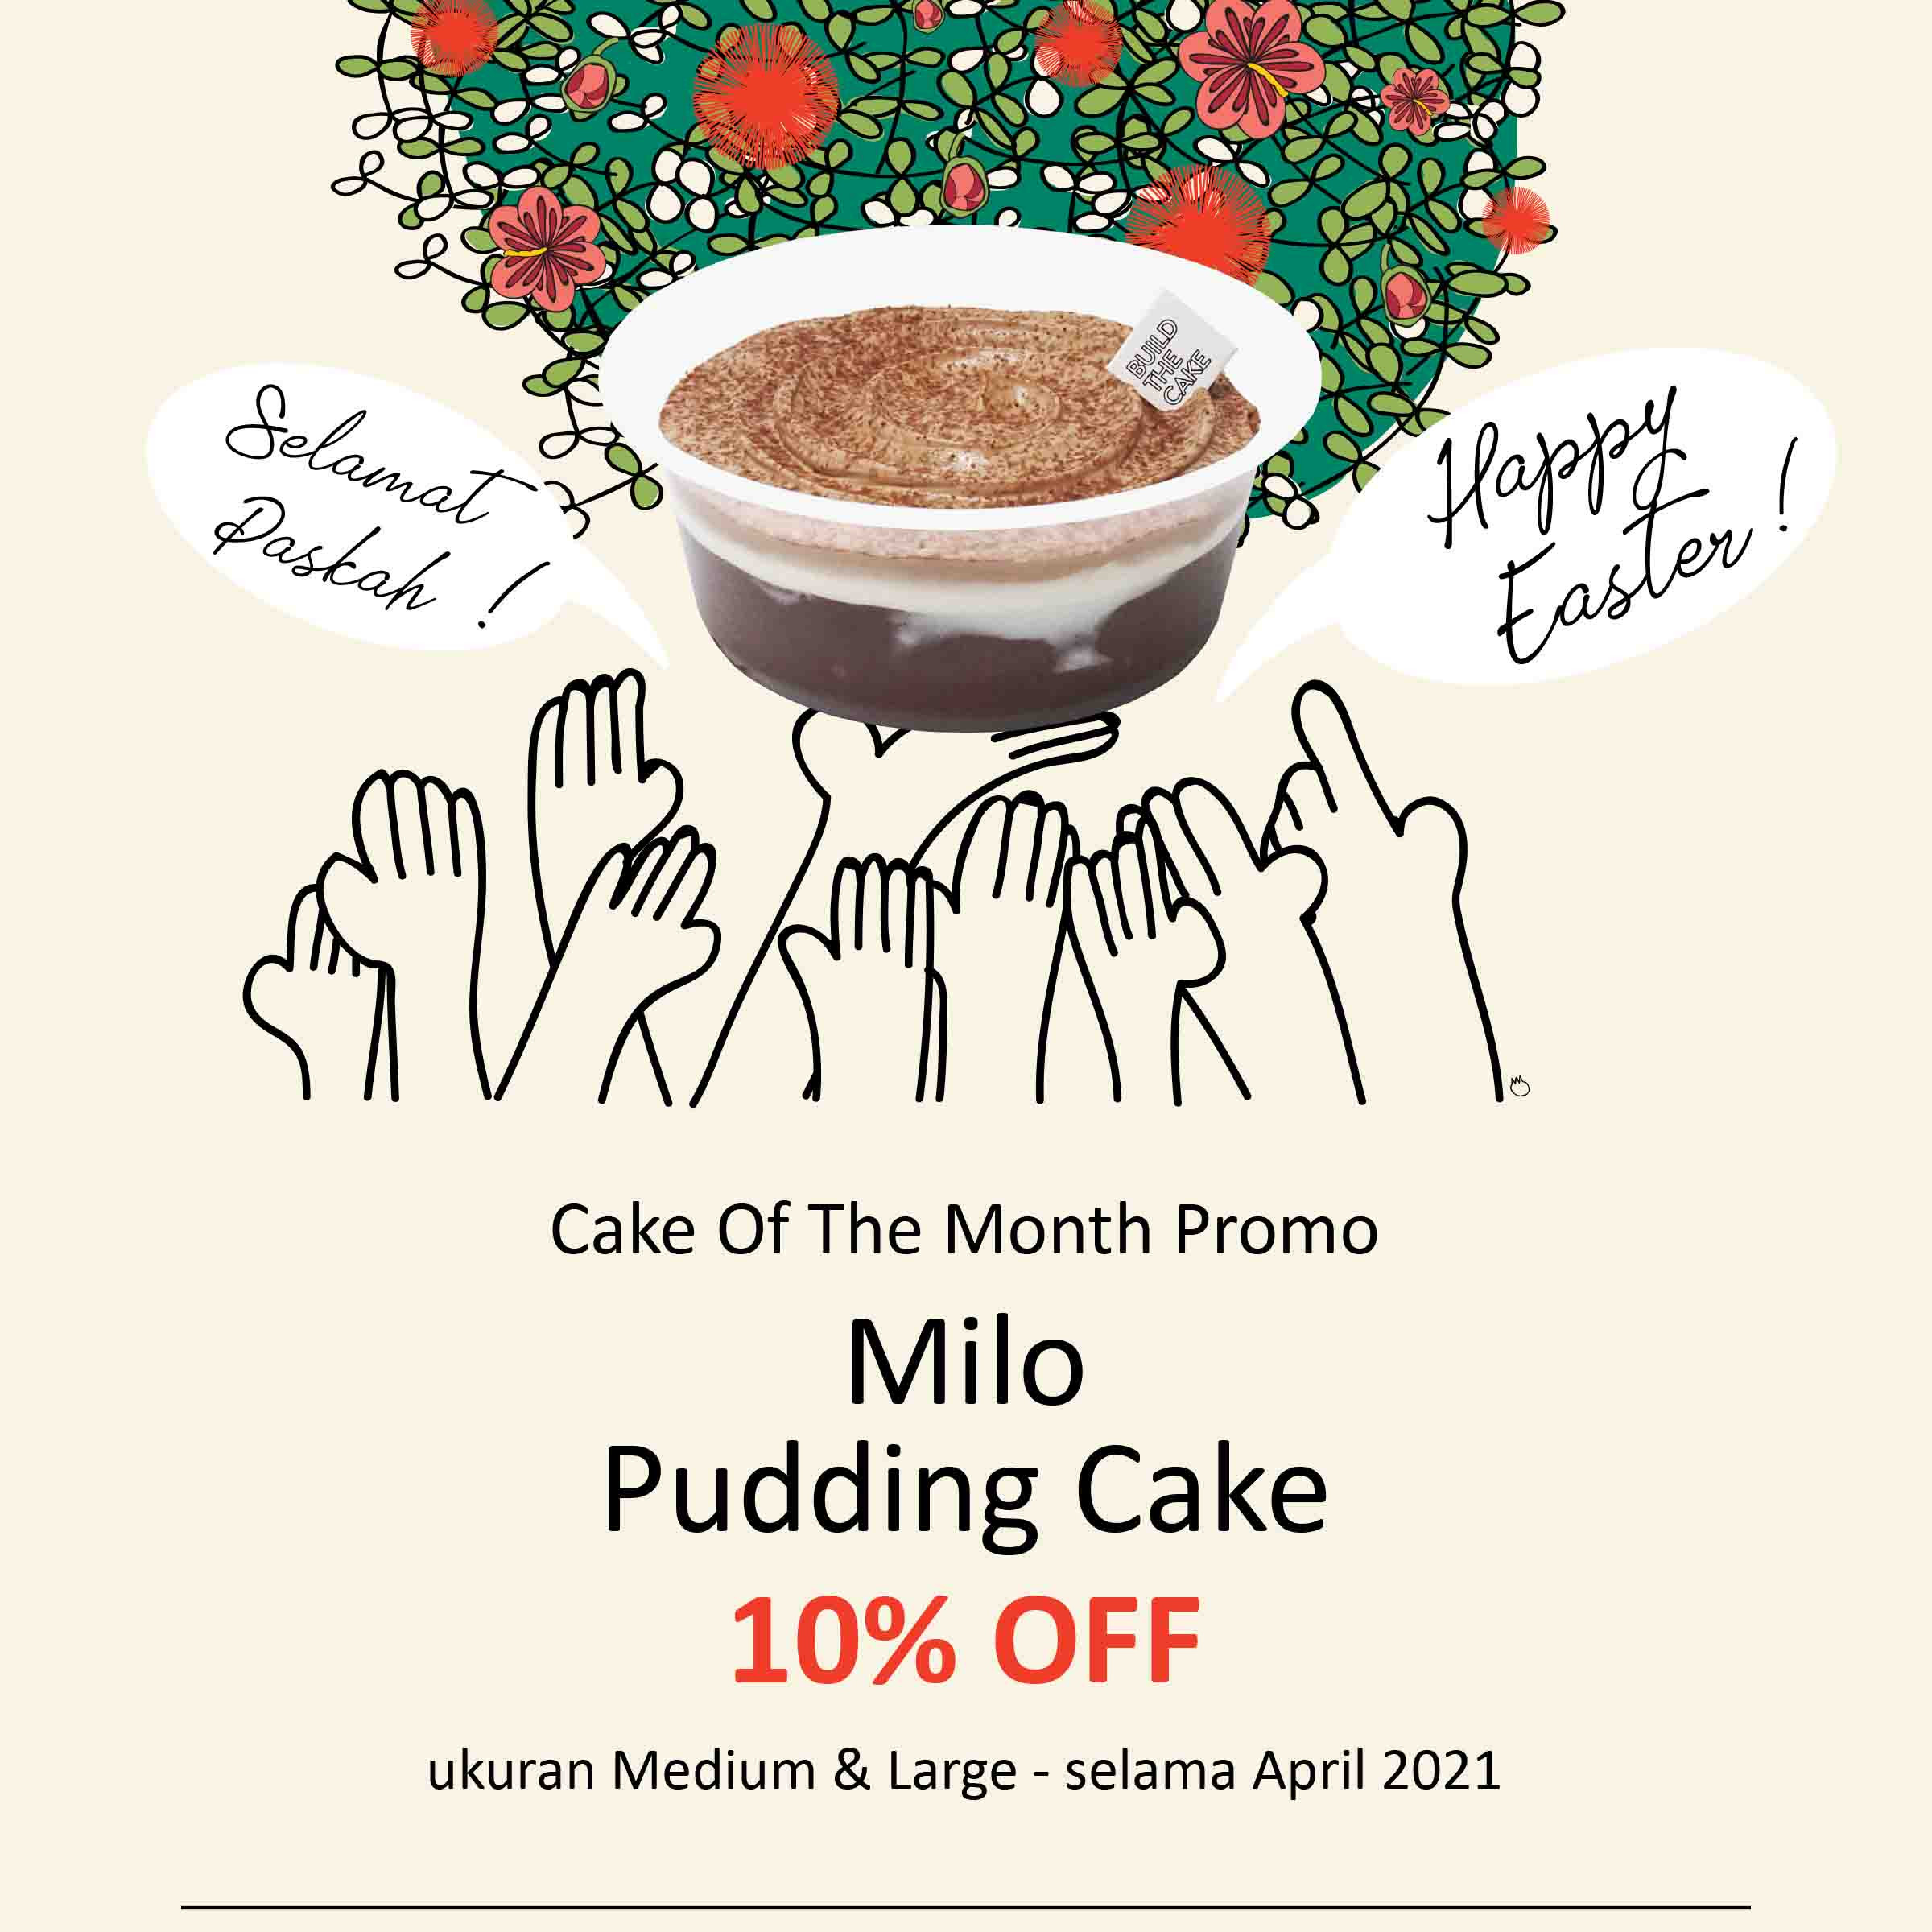 Milo Pudding Cake